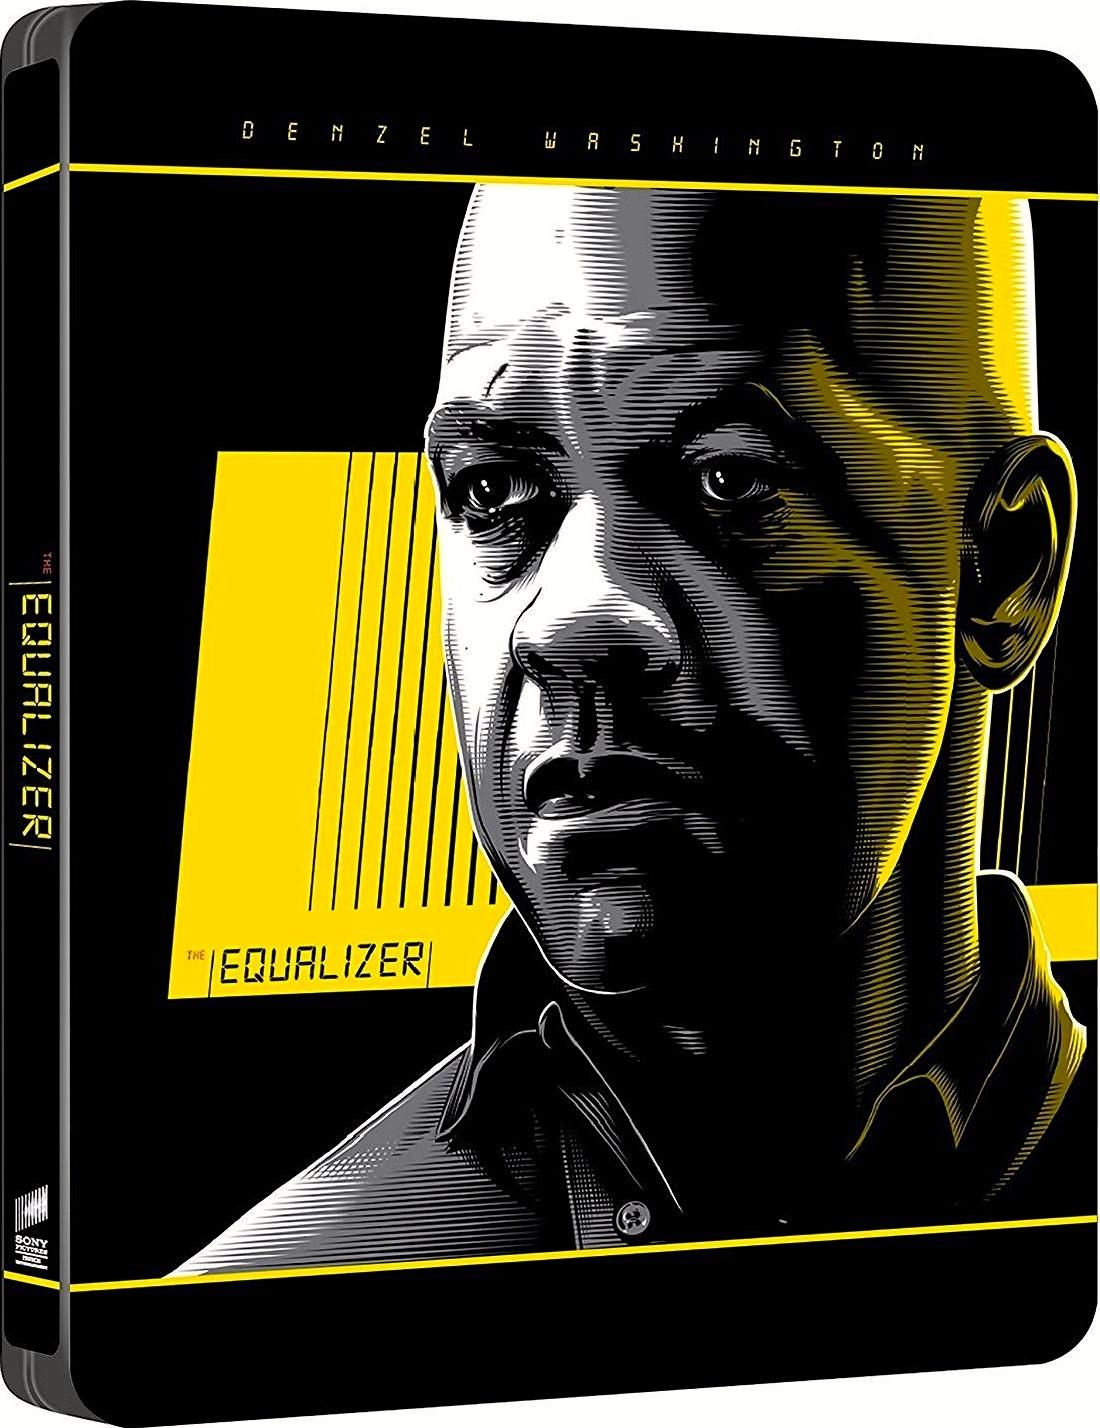 The Equalizer 4K (SteelBook)(2014) Ultra HD Blu-ray